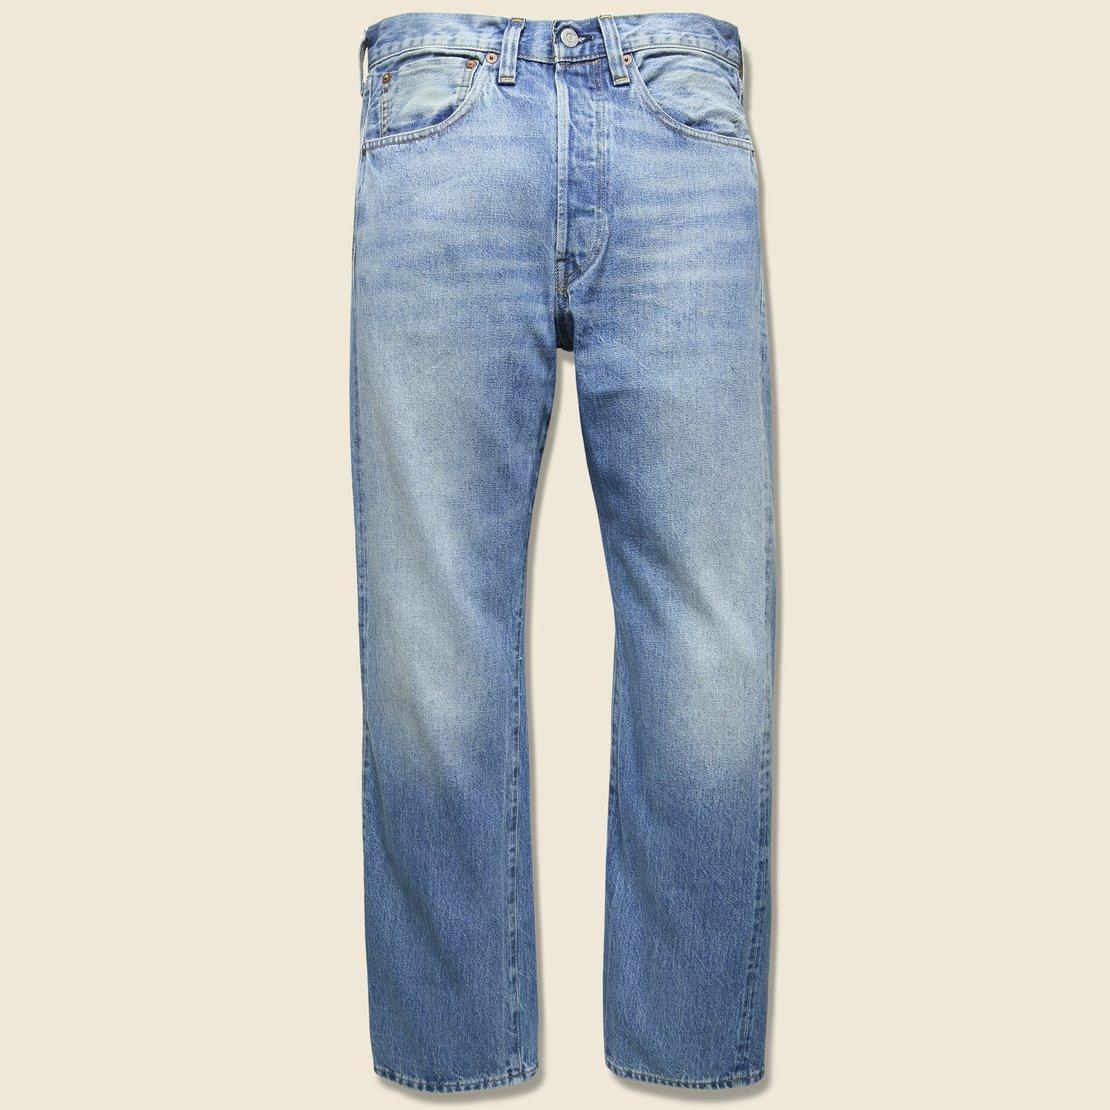 Levi's Vintage Clothing 501